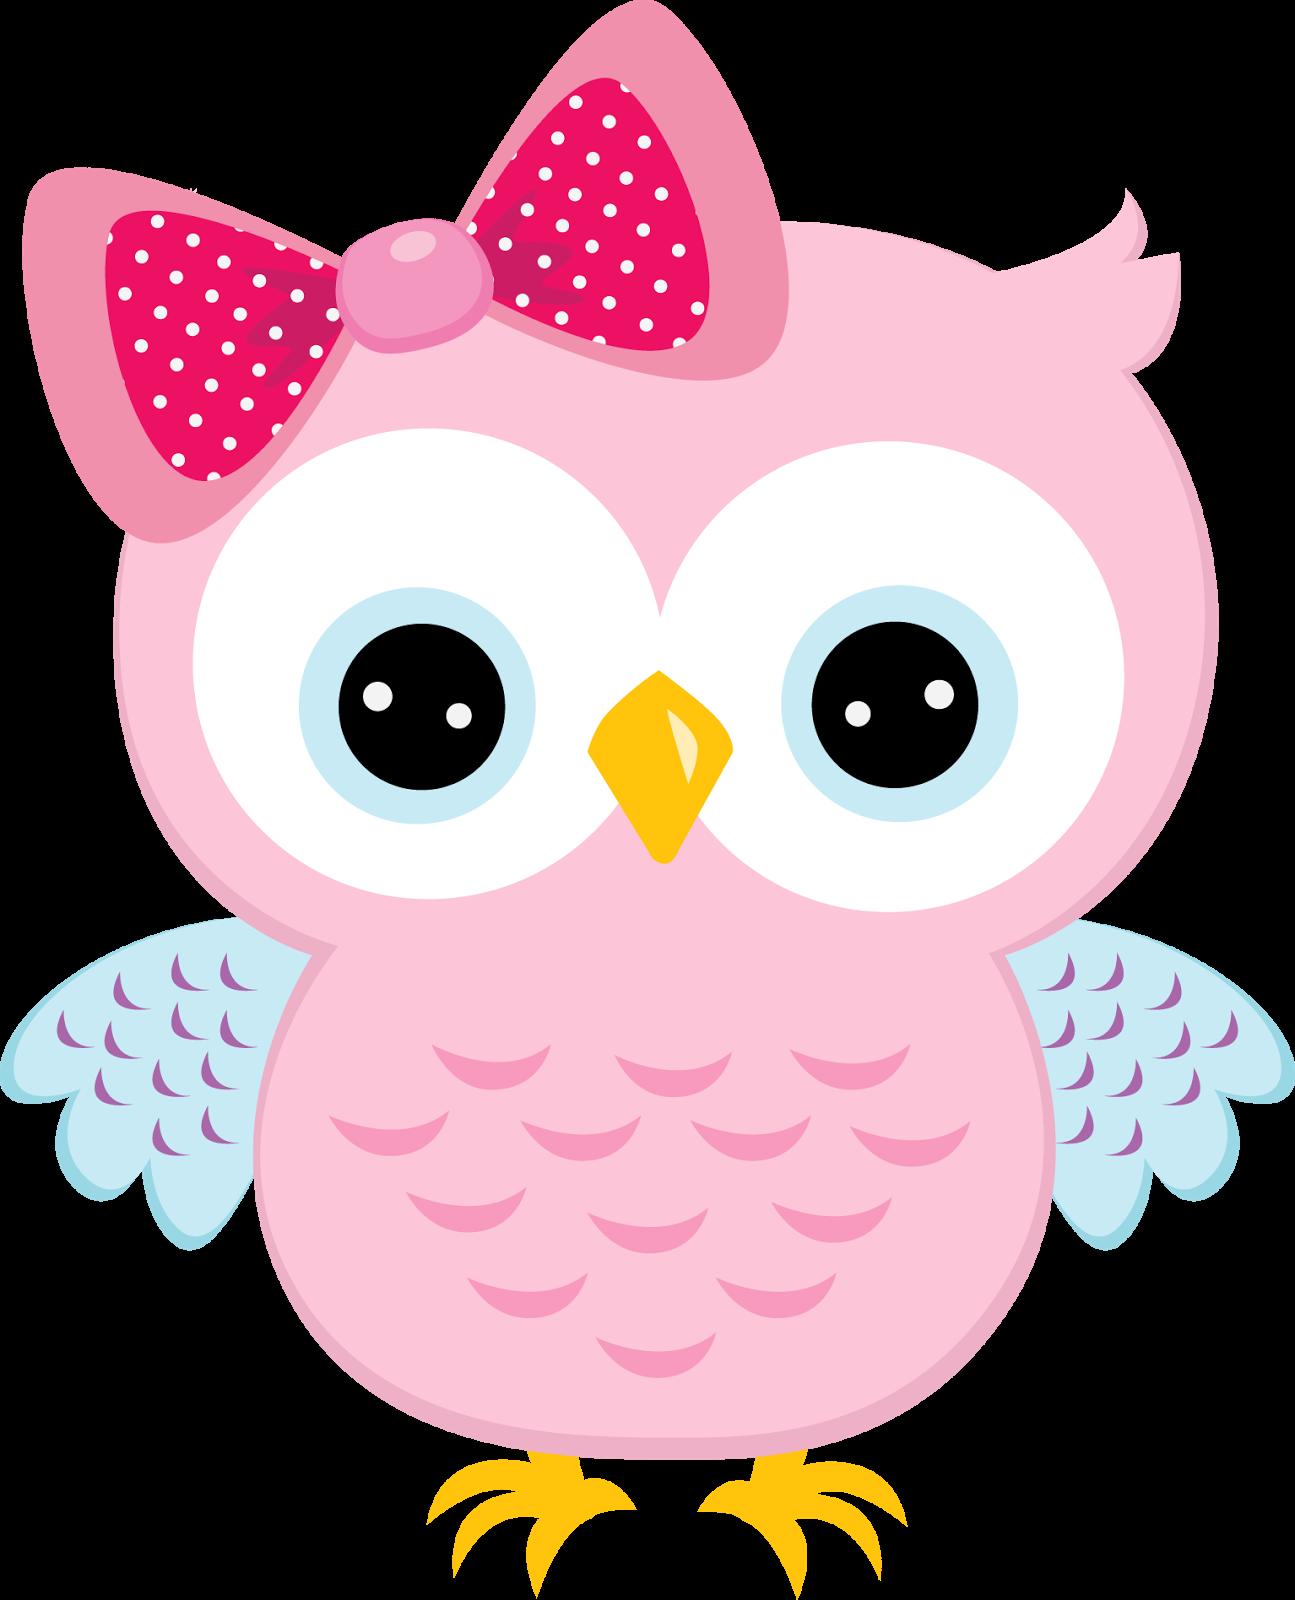 Cute owl holding a flower clipart clip art freeuse download ibd717HGTAvMe4.png 1.295×1.600 piksel   denemek gerek   Pinterest ... clip art freeuse download